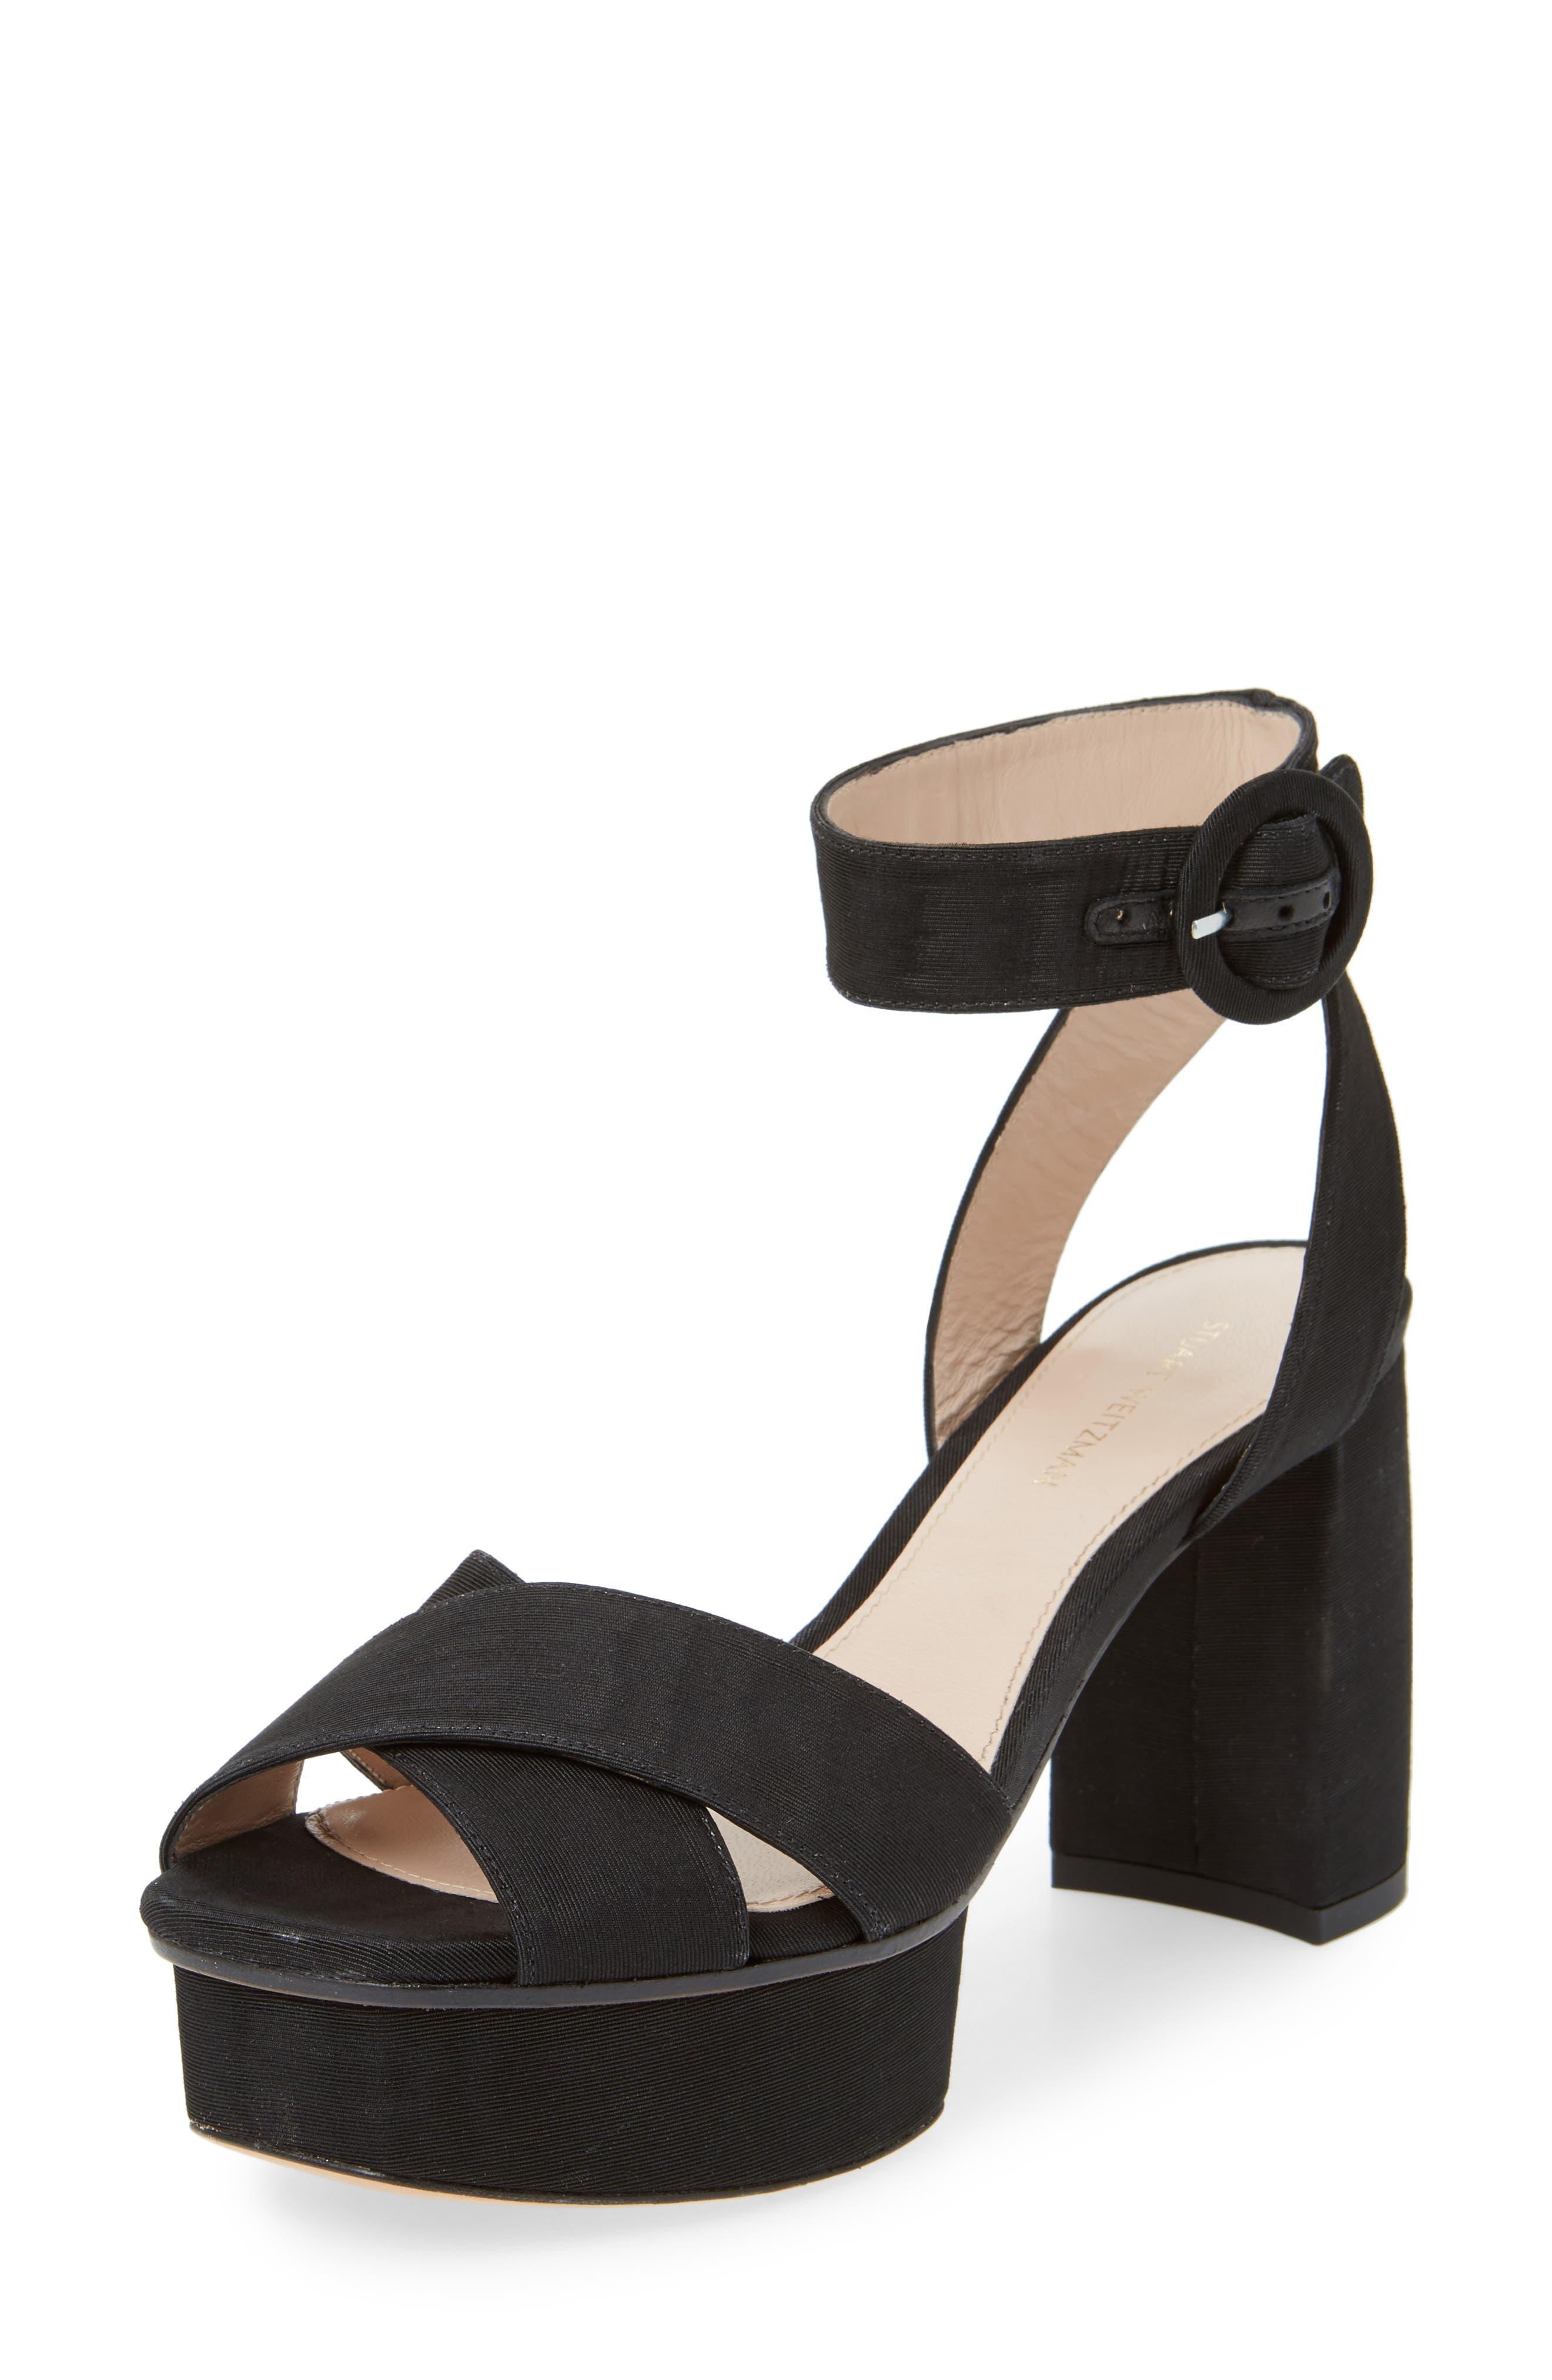 Carmina Ankle Strap Platform Sandal,                             Main thumbnail 1, color,                             001